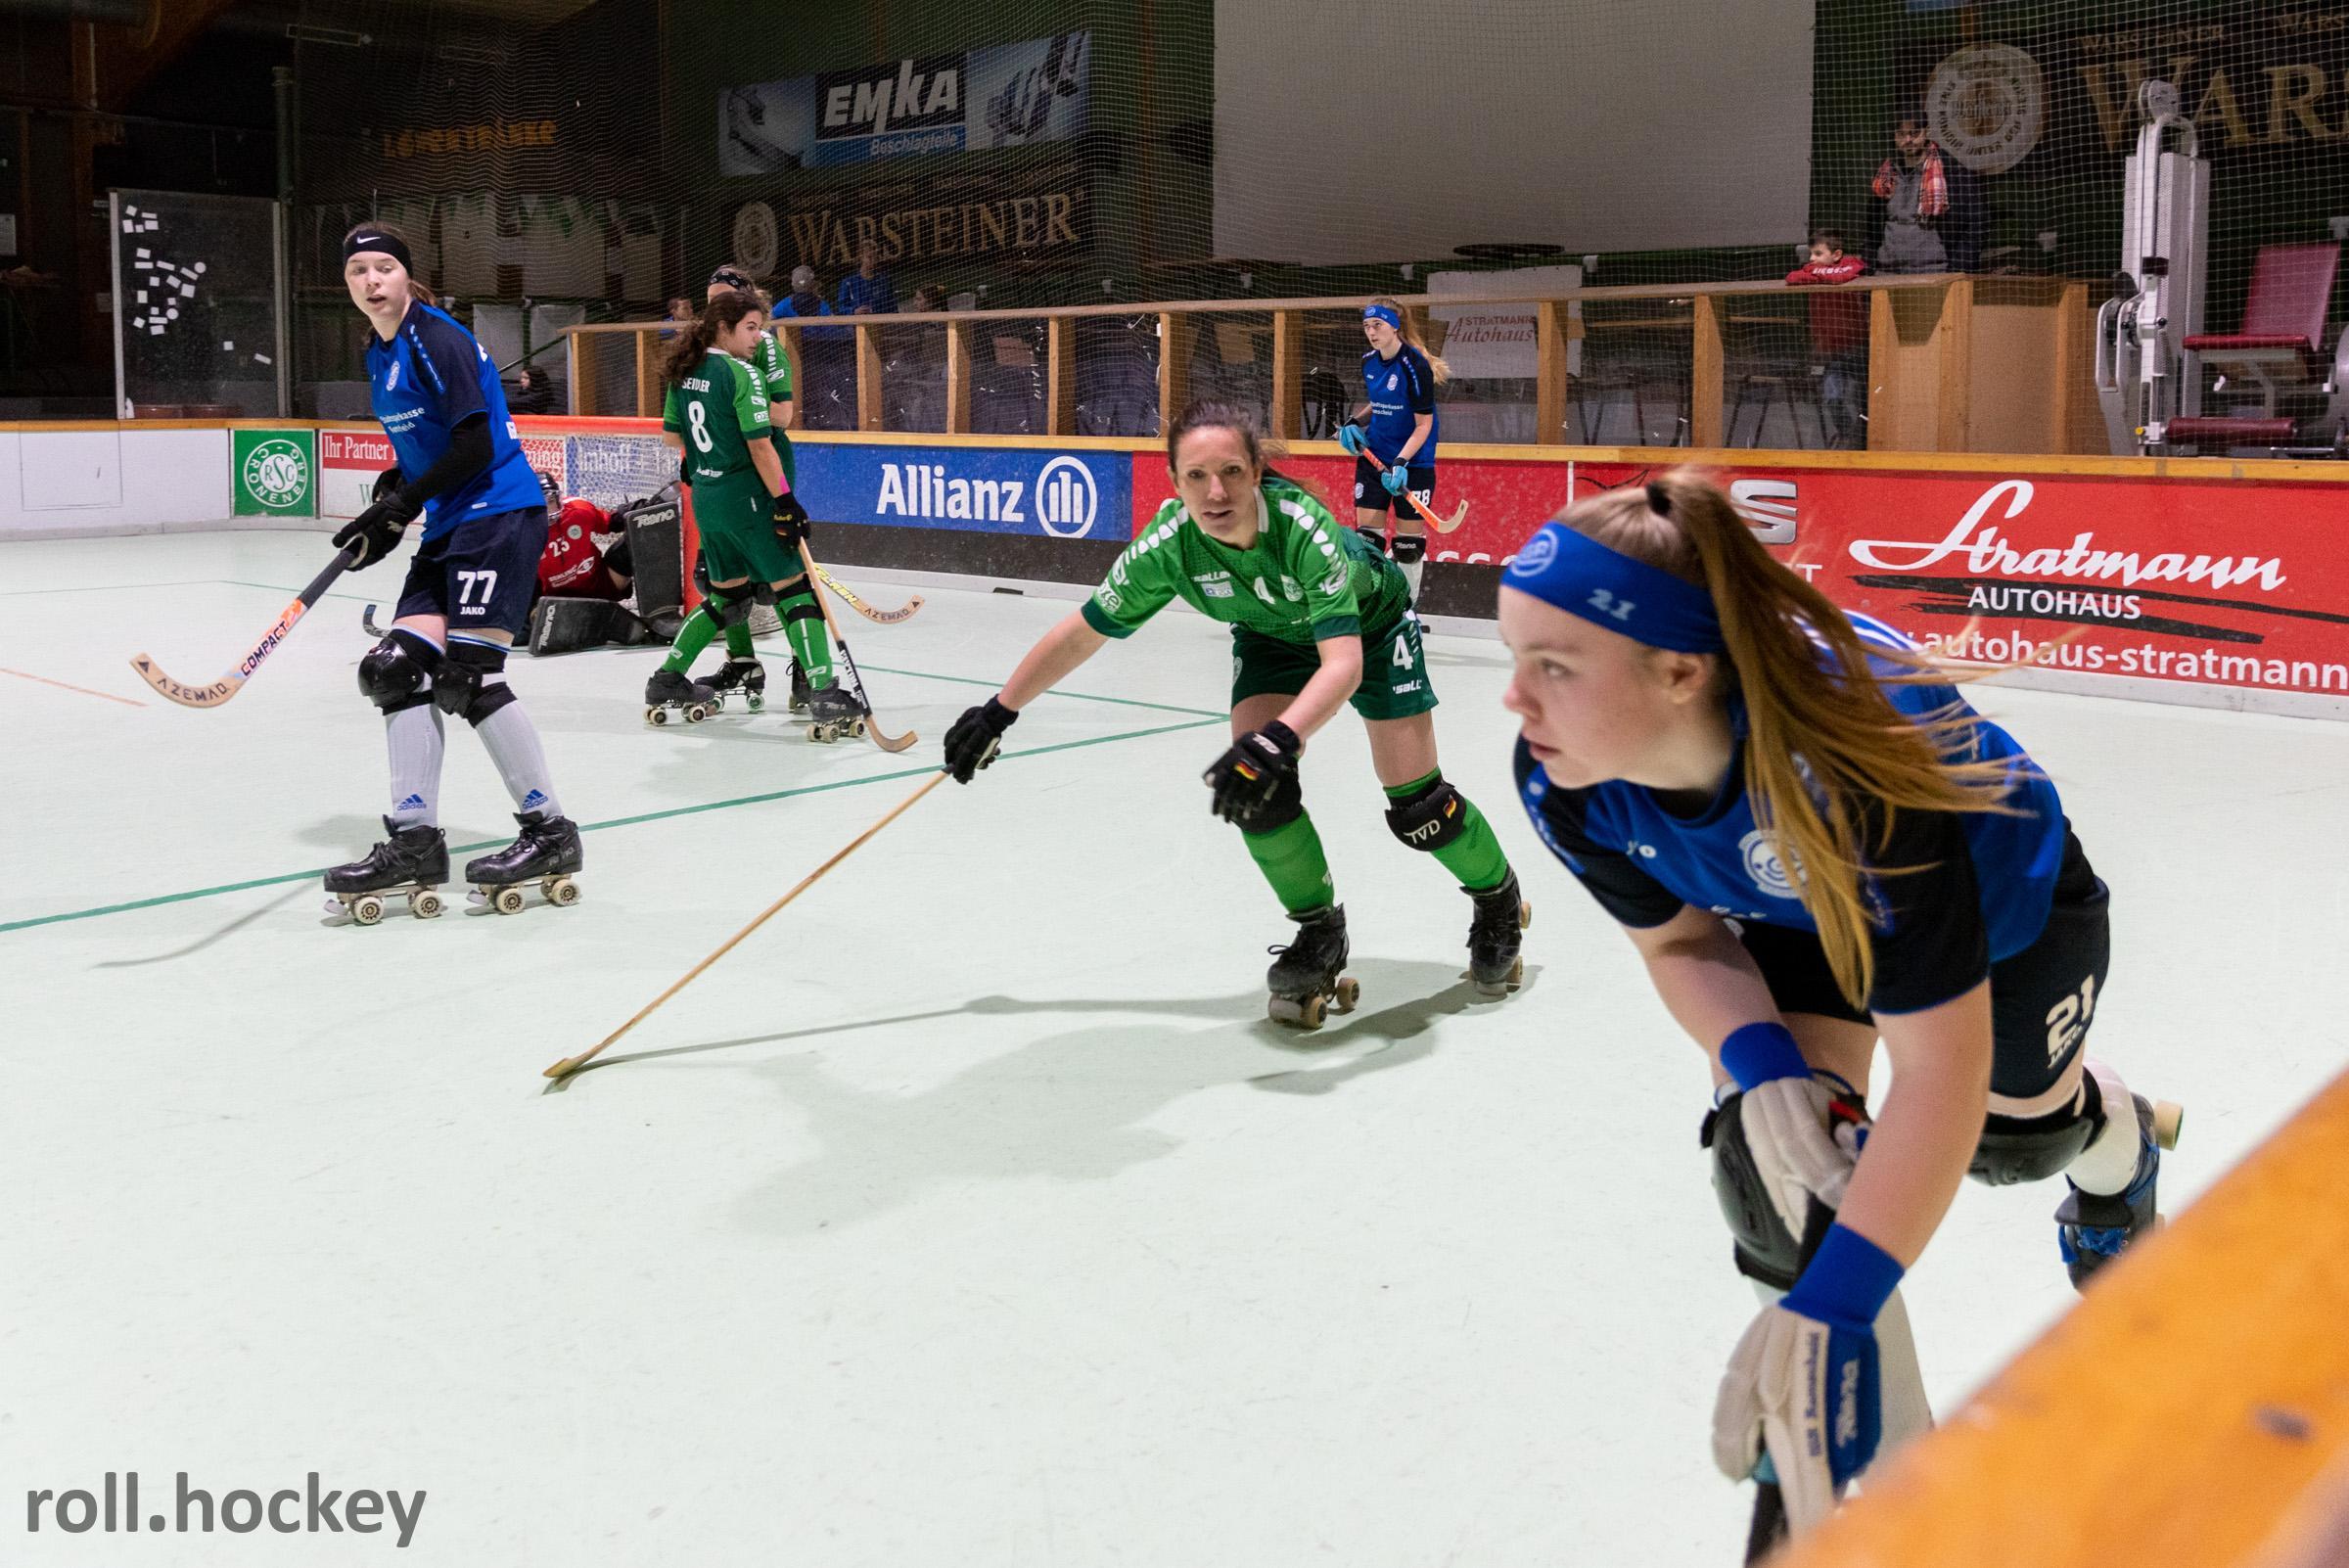 RSC Cronenberg Rollhockey Bundesliga Damen Spieltag 14.12.2019